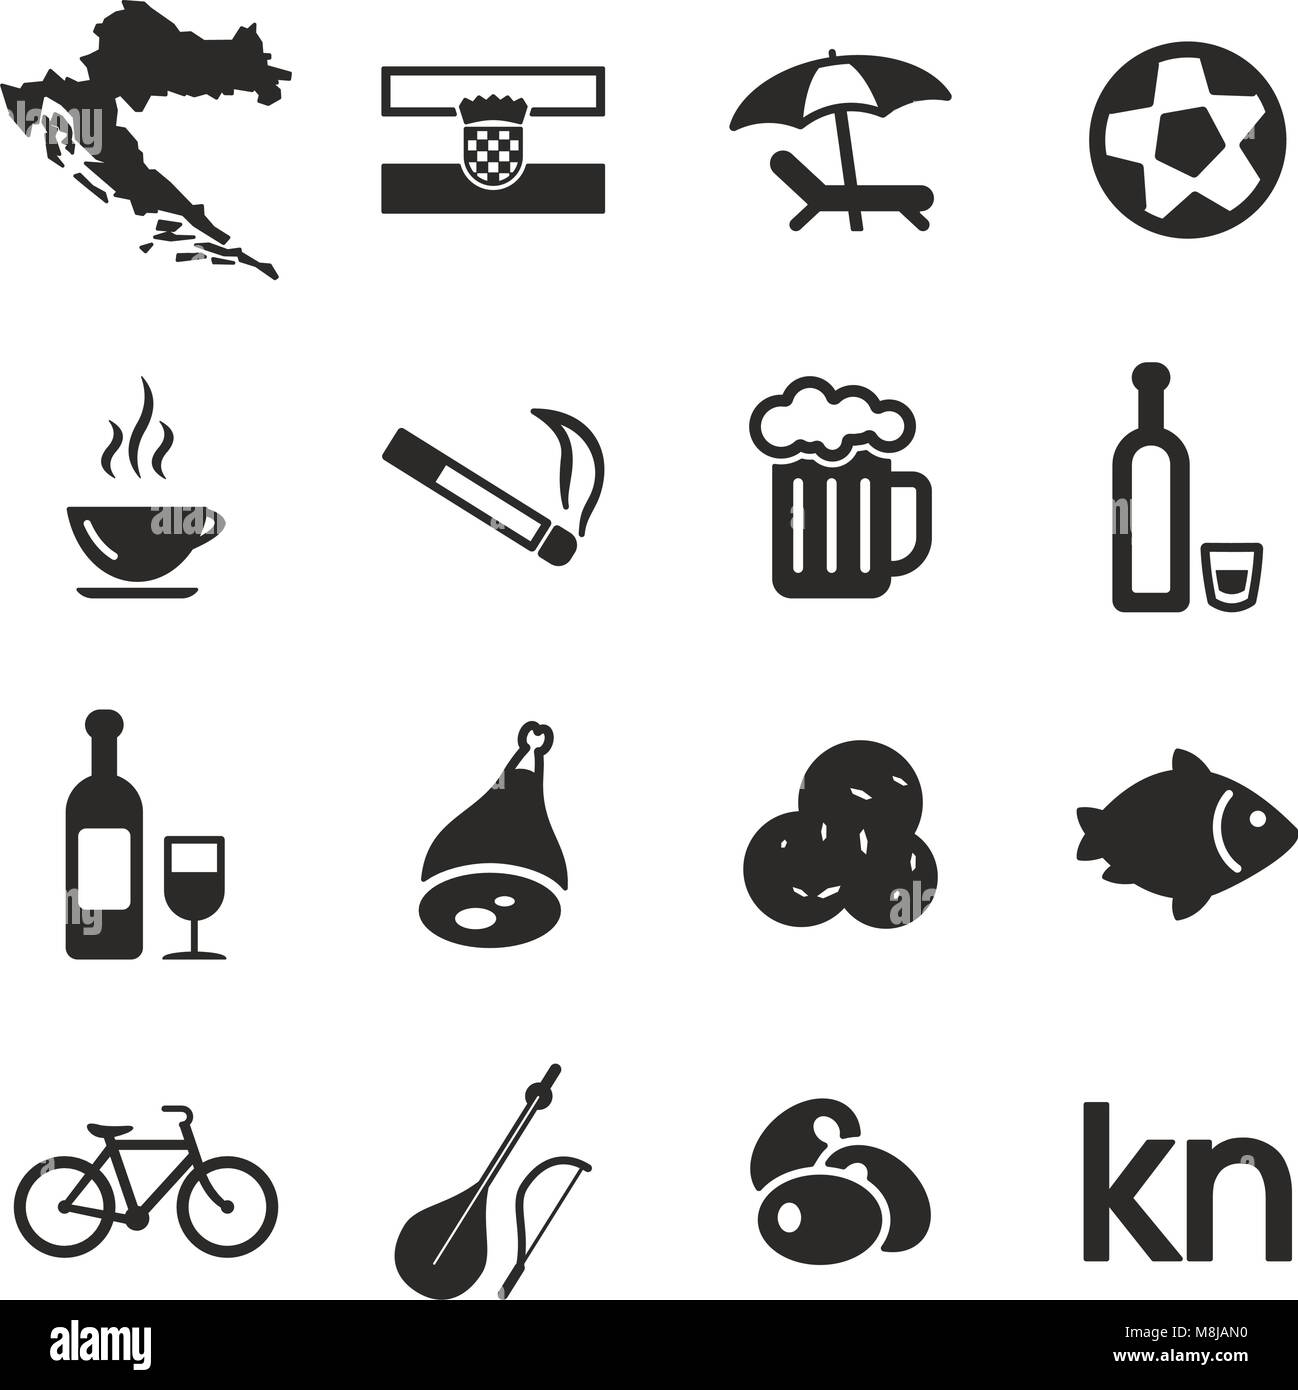 Croatia Icons - Stock Image